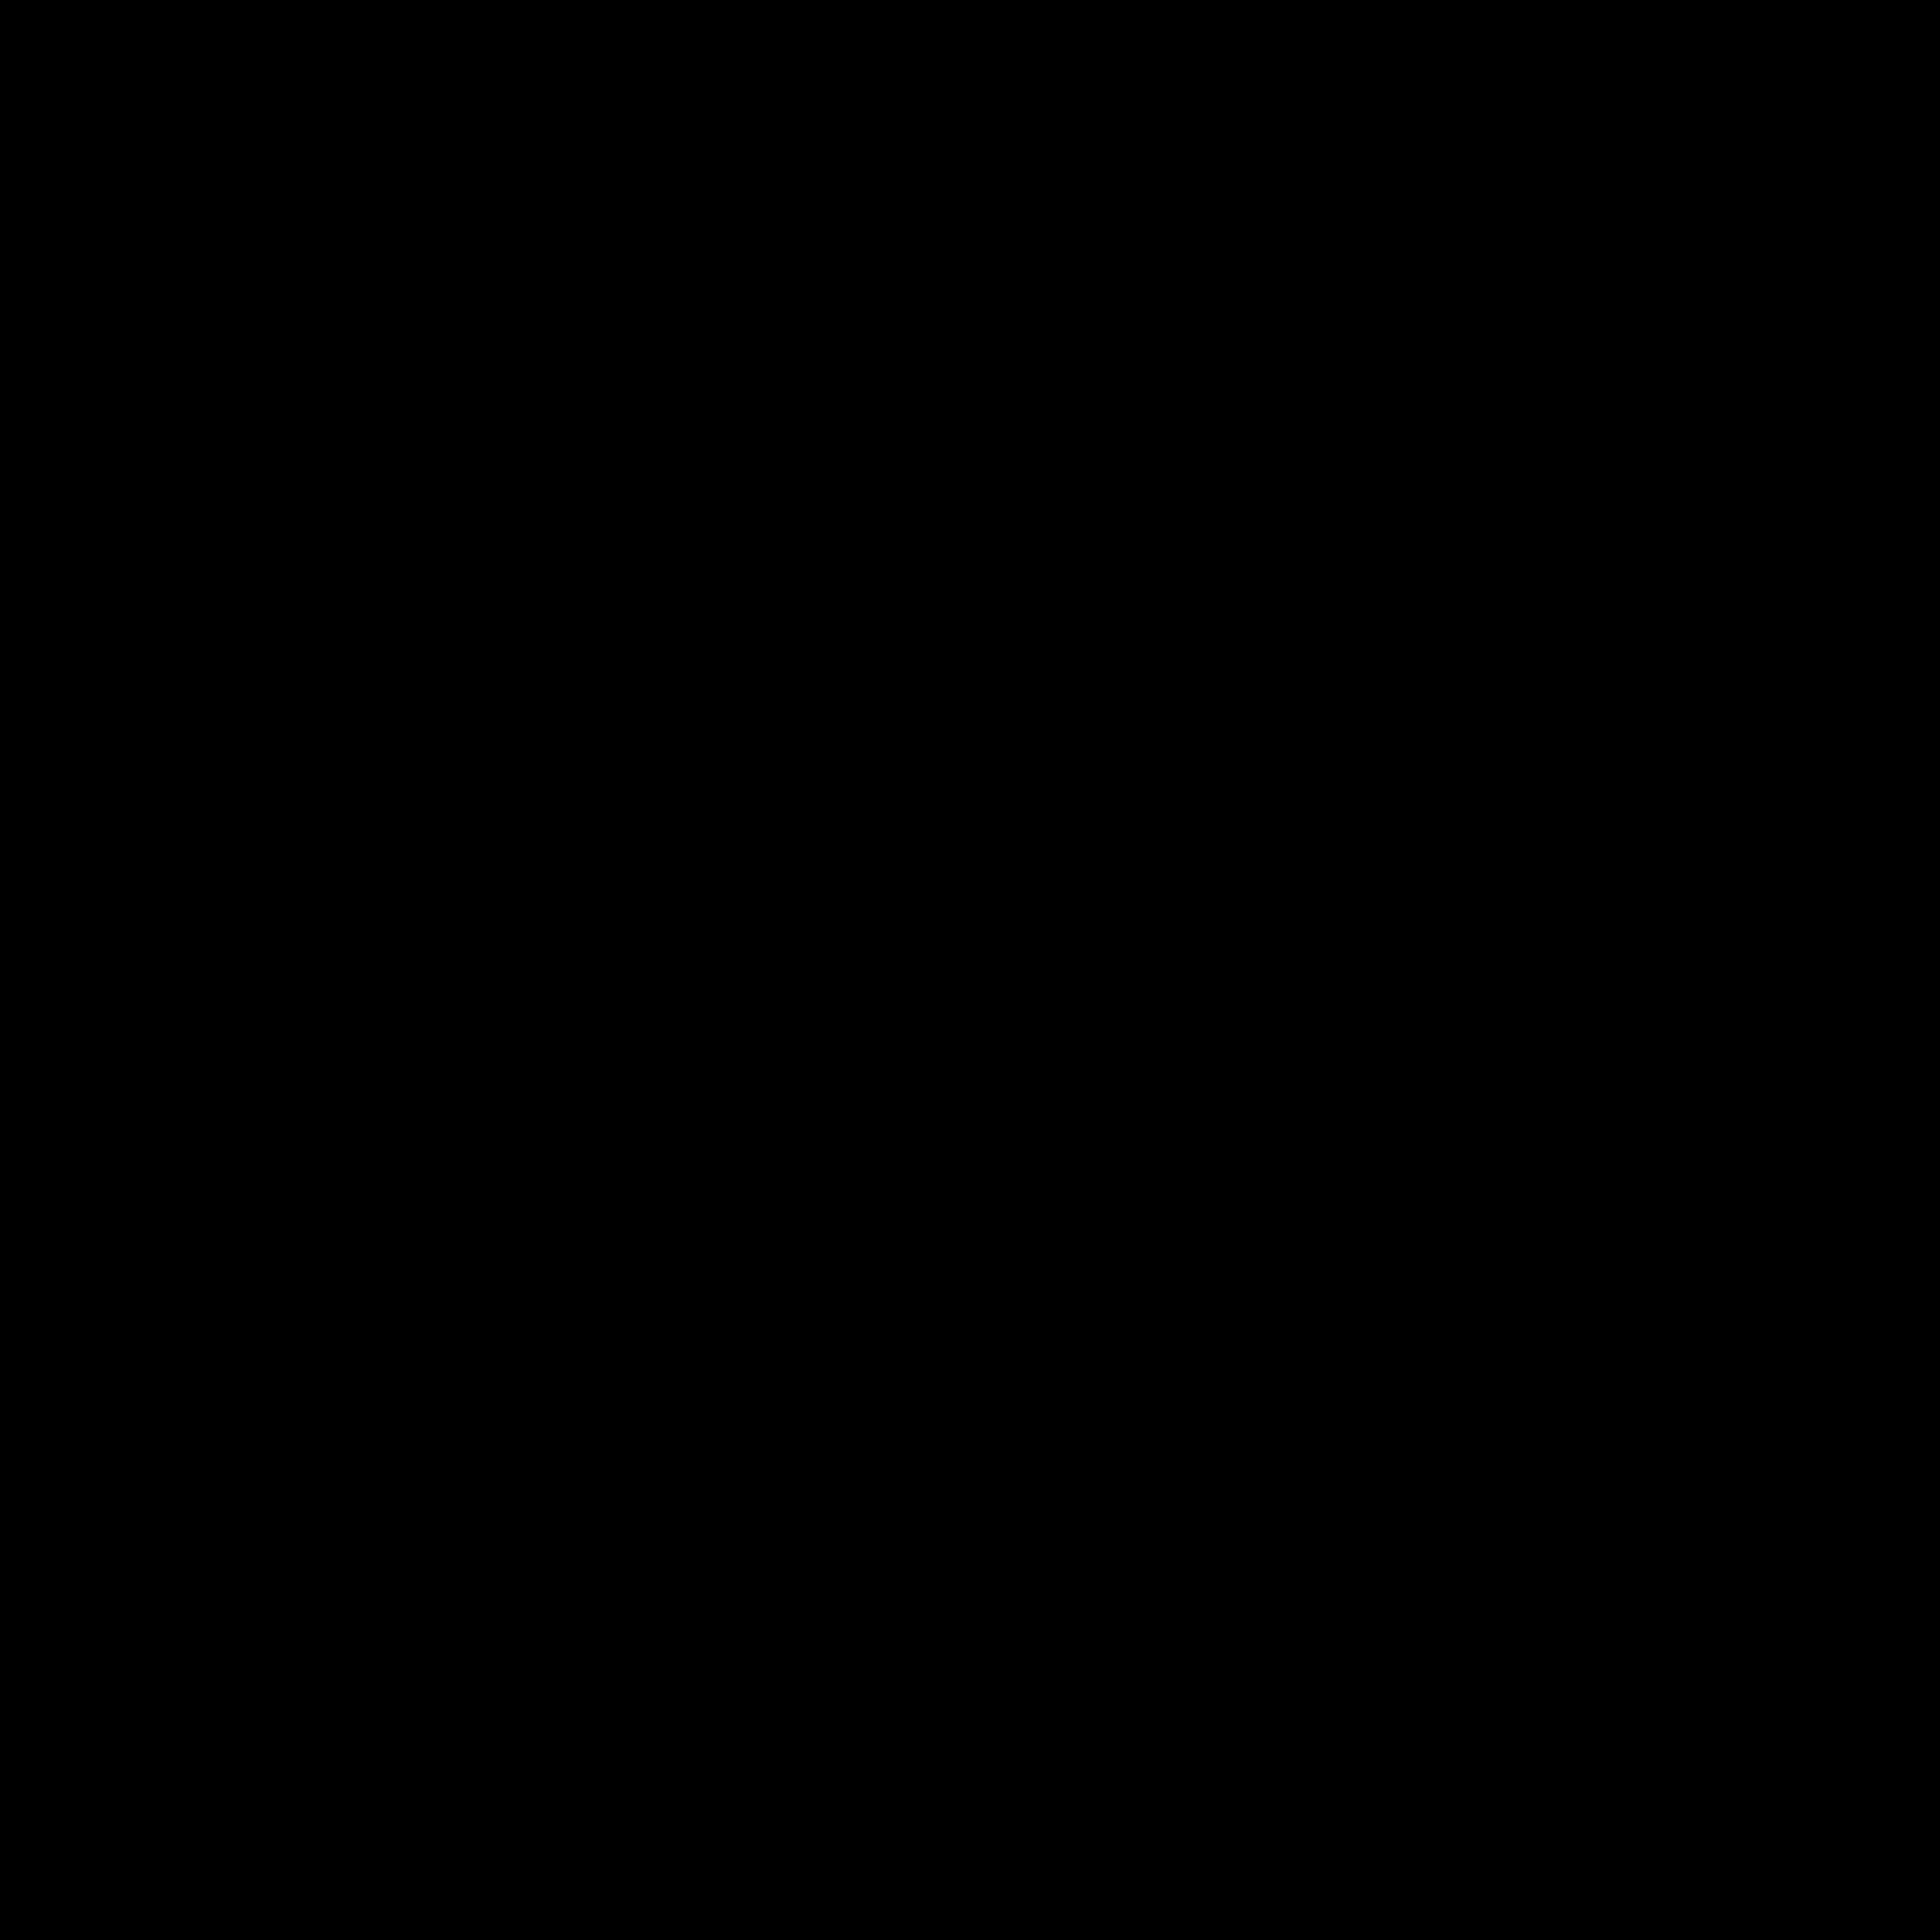 File:Symbol solid precipitation 79.svg.